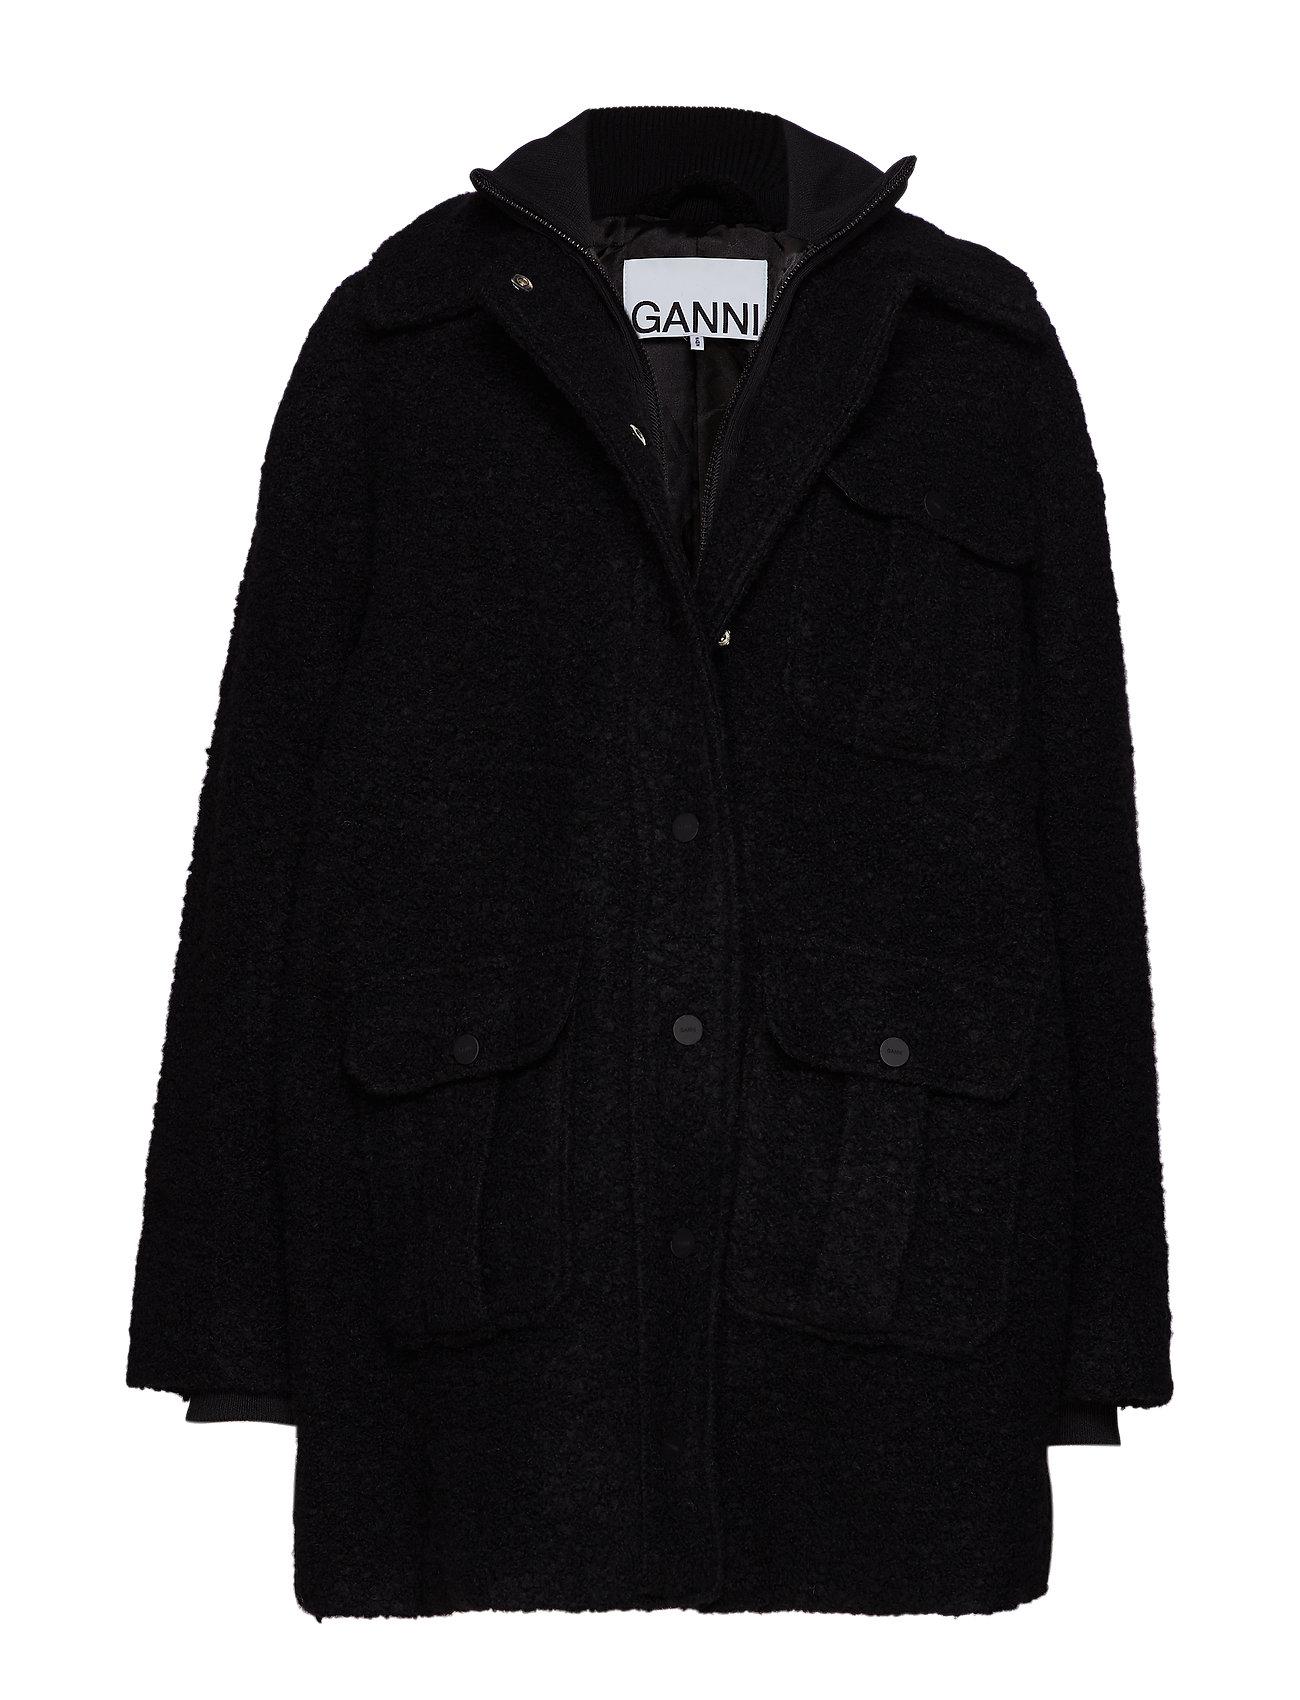 Ganni Boucle Wool Jacket - BLACK